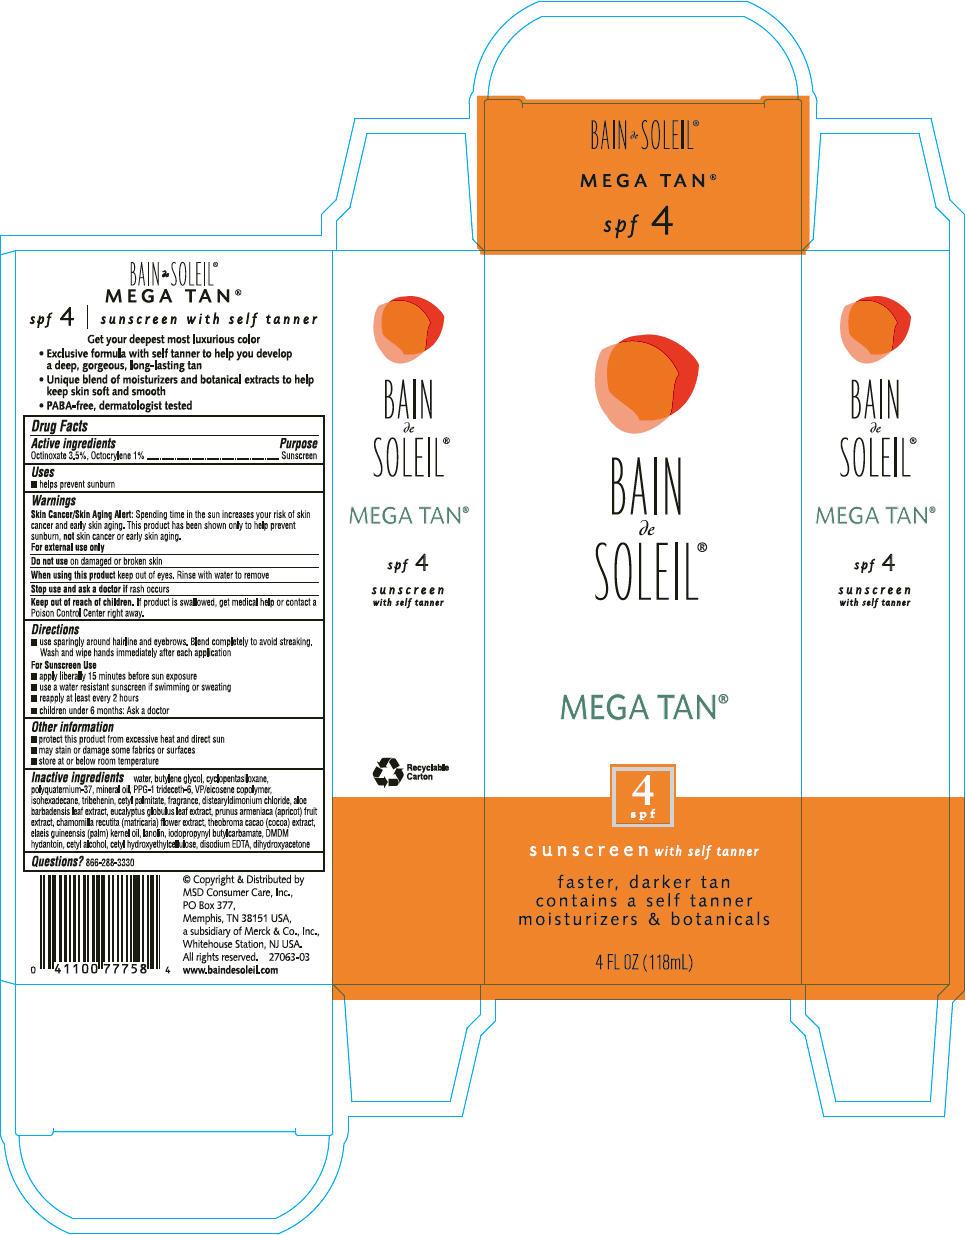 Bain De Soleil Mega Tan Spf 4 (Octinoxate And Octocrylene) Lotion [Msd Consumer Care, Inc.]